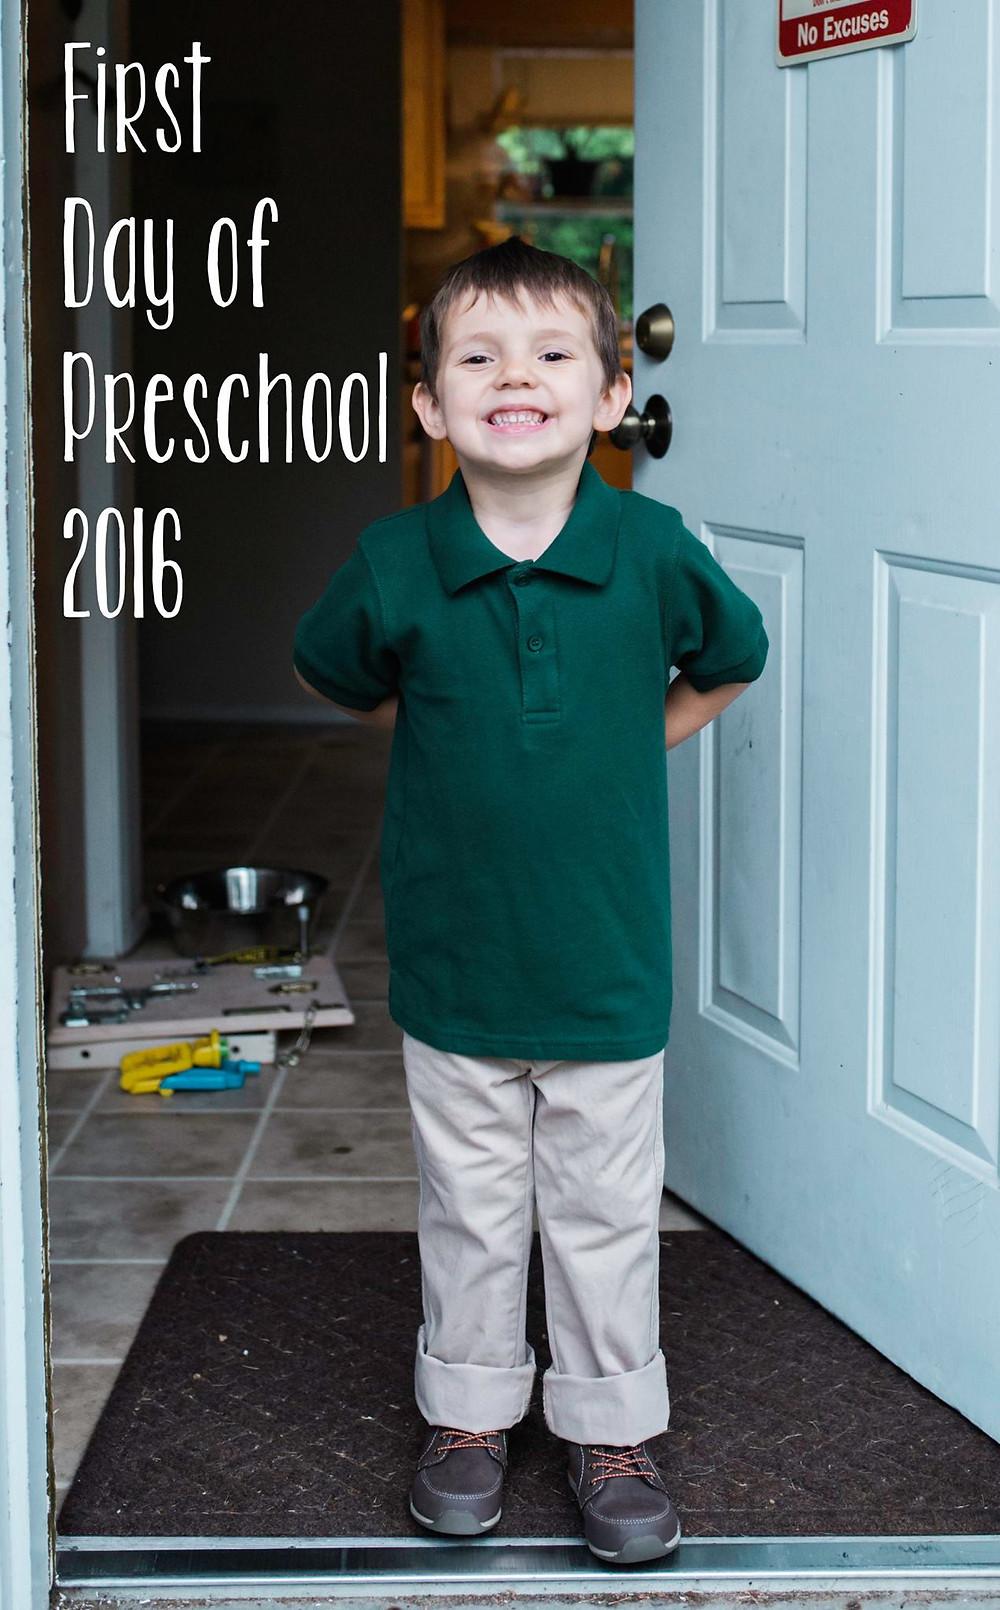 Boy first day of school